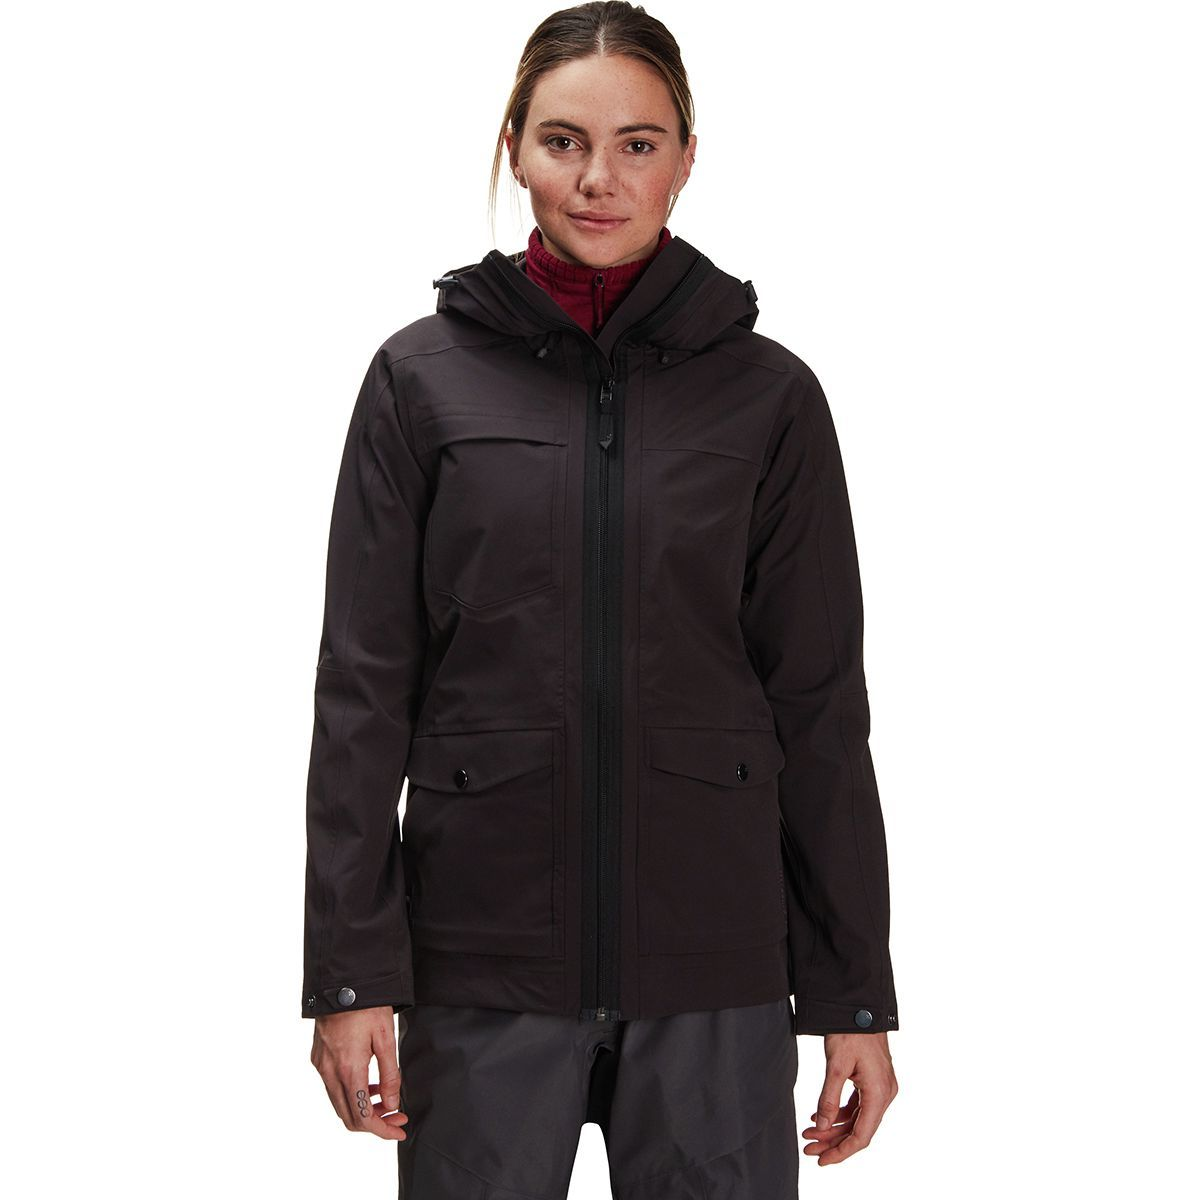 Haglofs Eco Proof Jacket - Women's